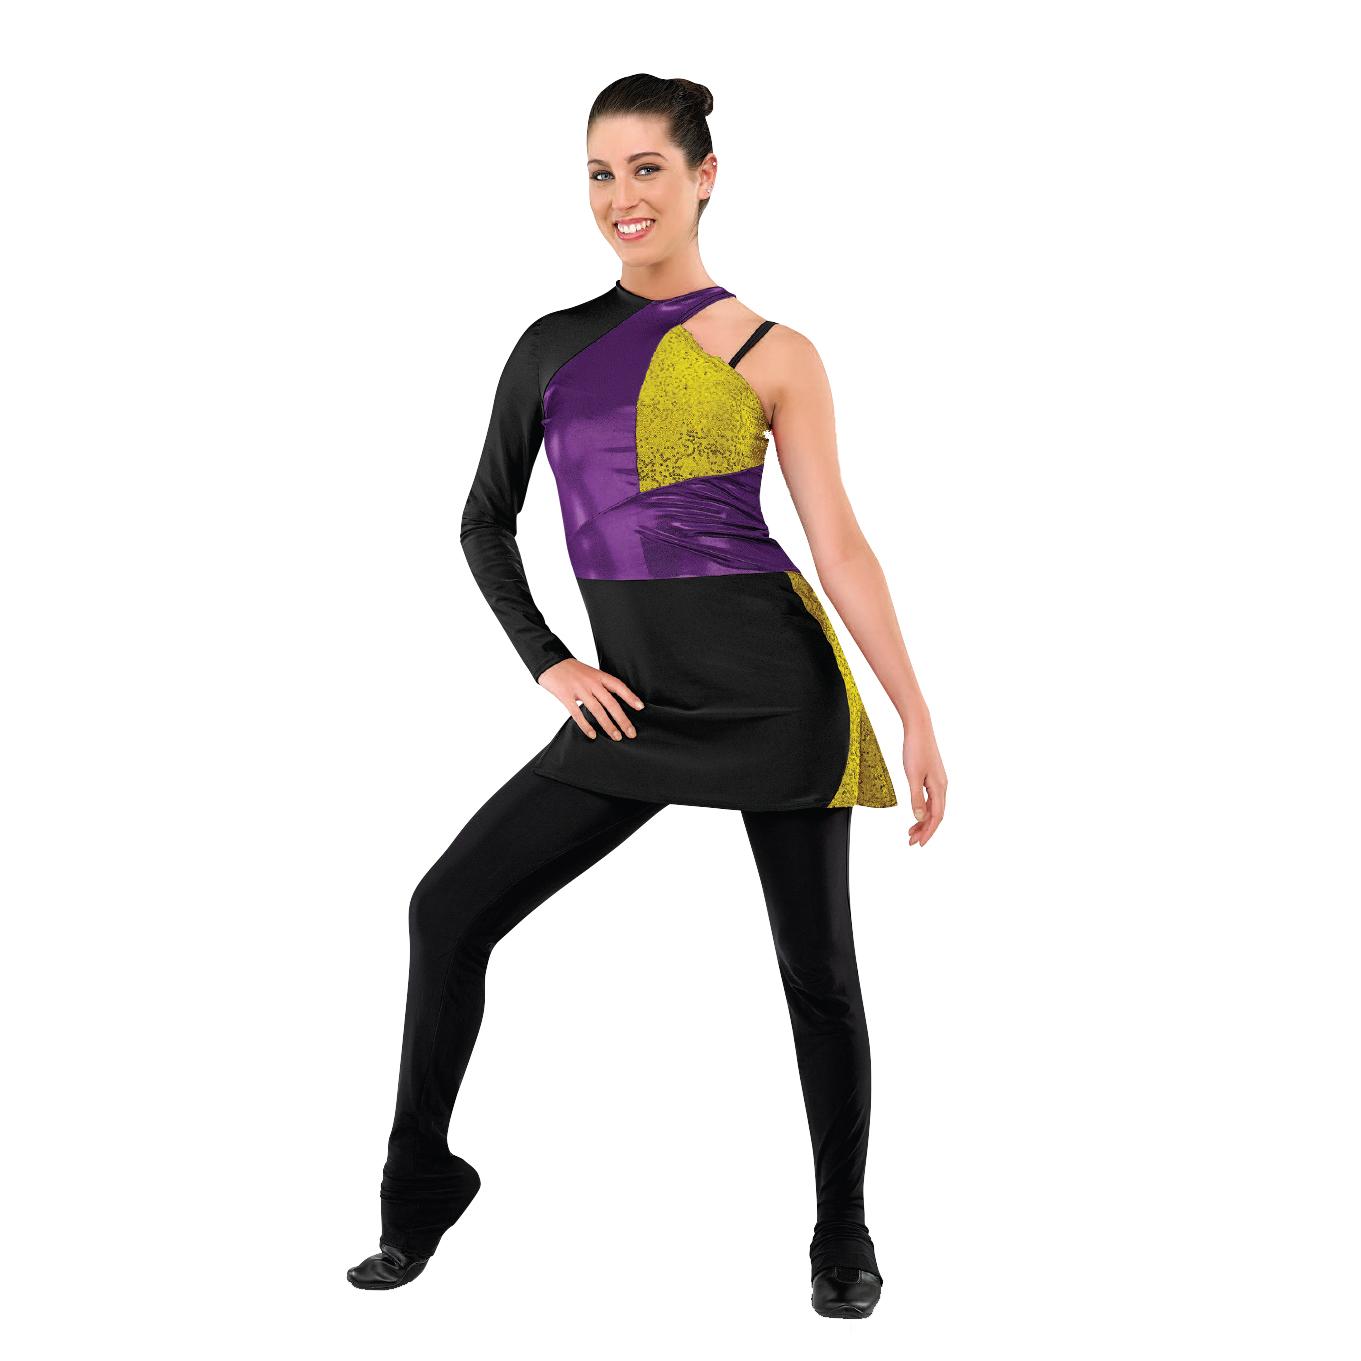 Guard Uniforms: Style 15013